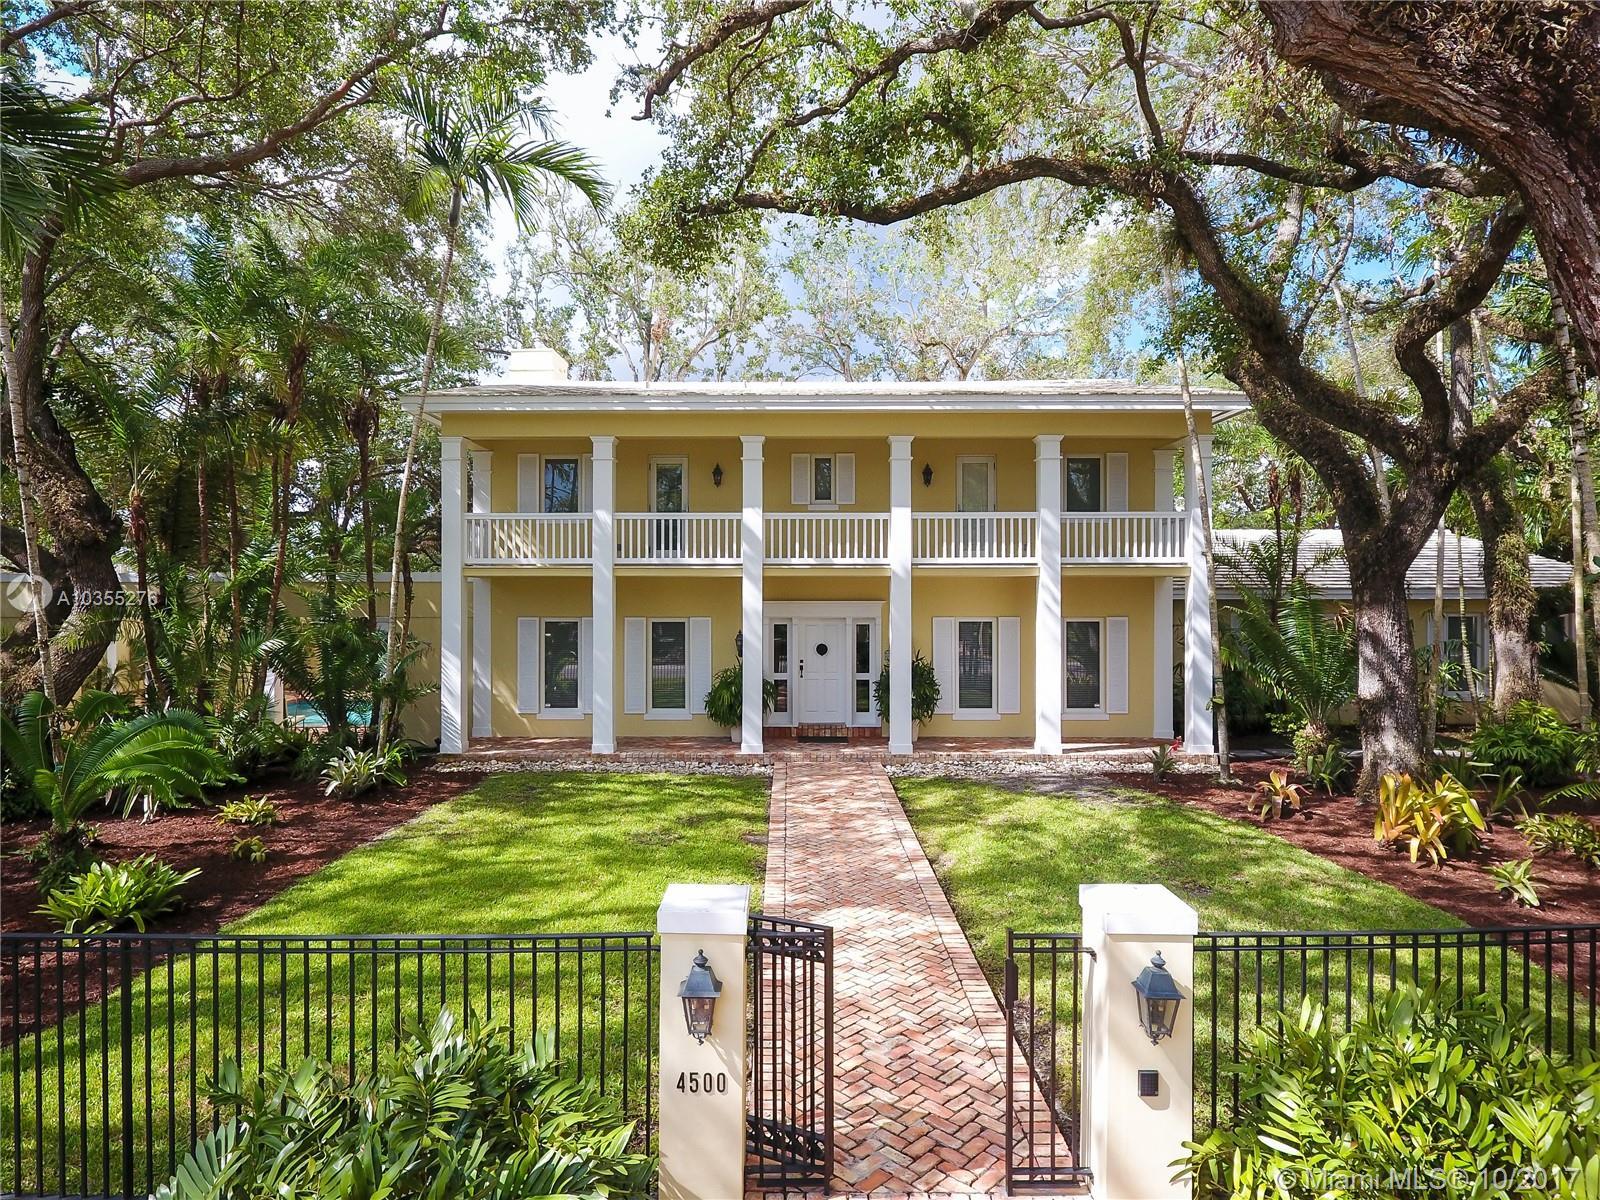 4500 University Drive - Coral Gables, Florida